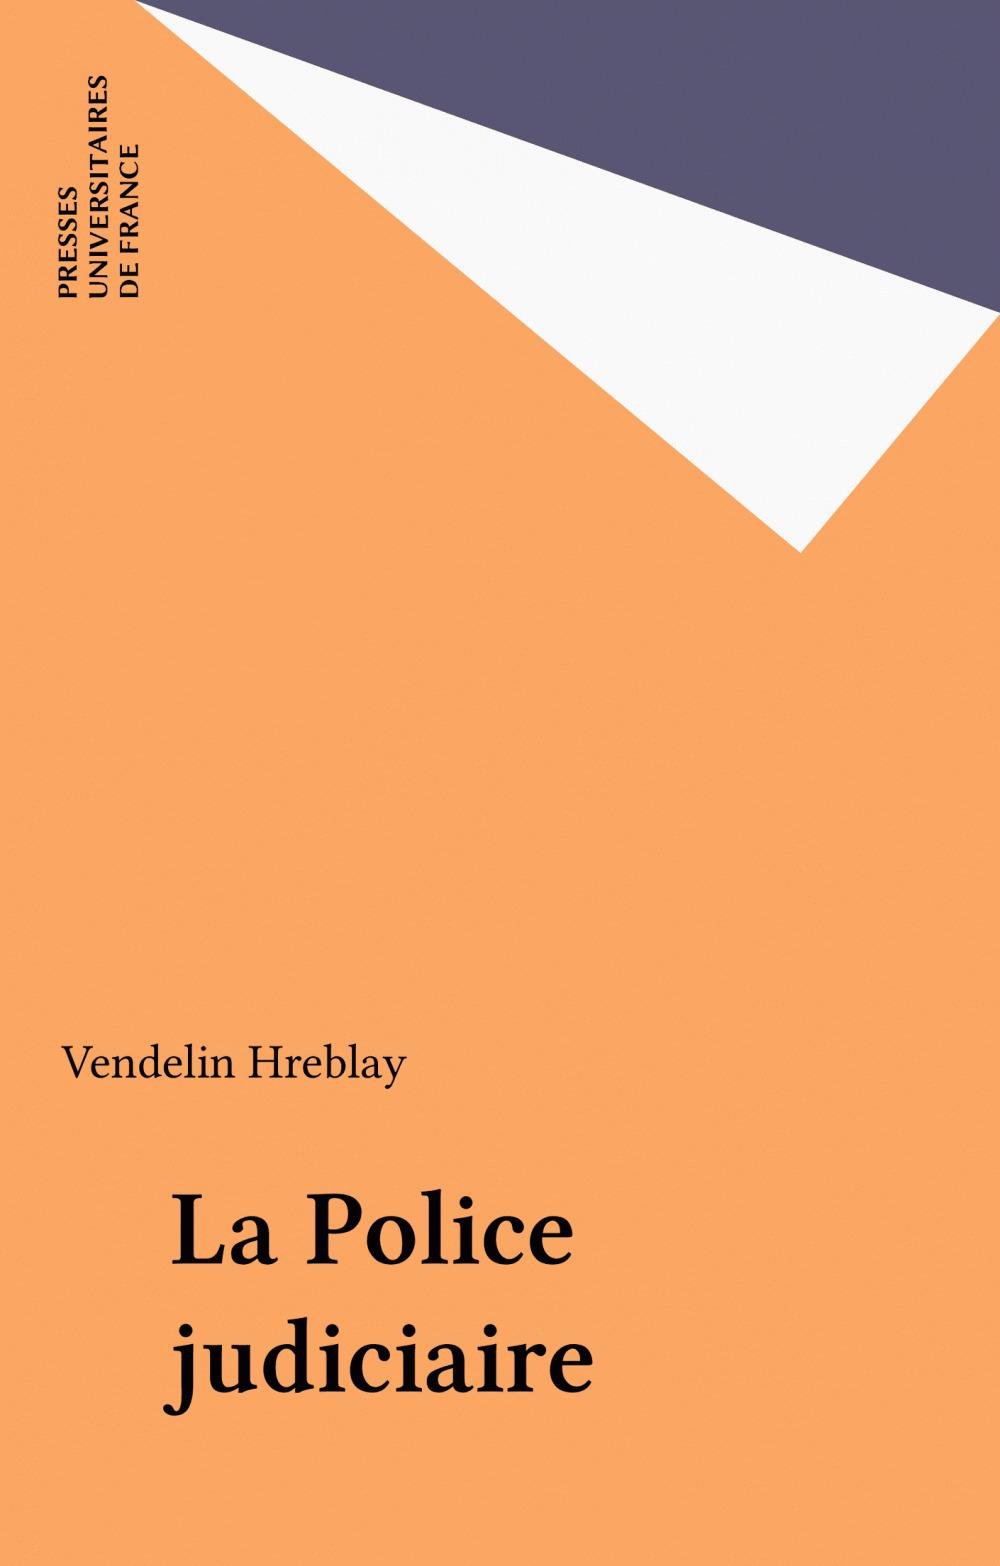 Vendelin Hreblay La Police judiciaire